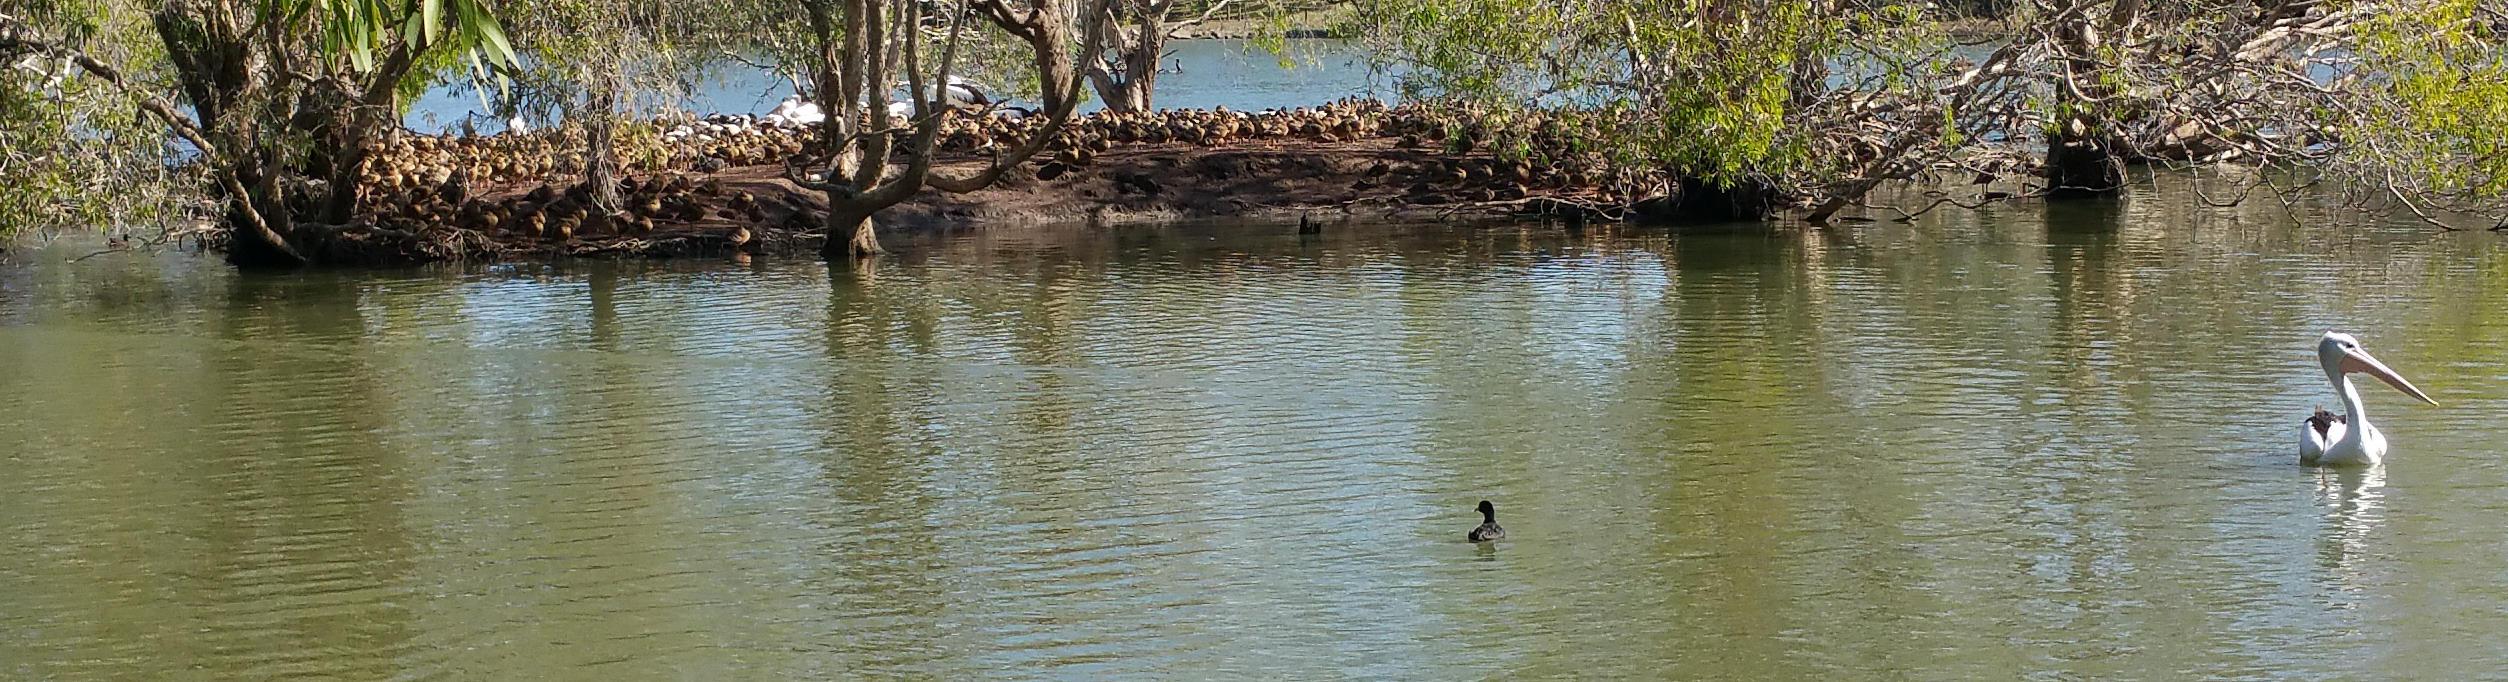 A rockery of ducks at Bundaberg